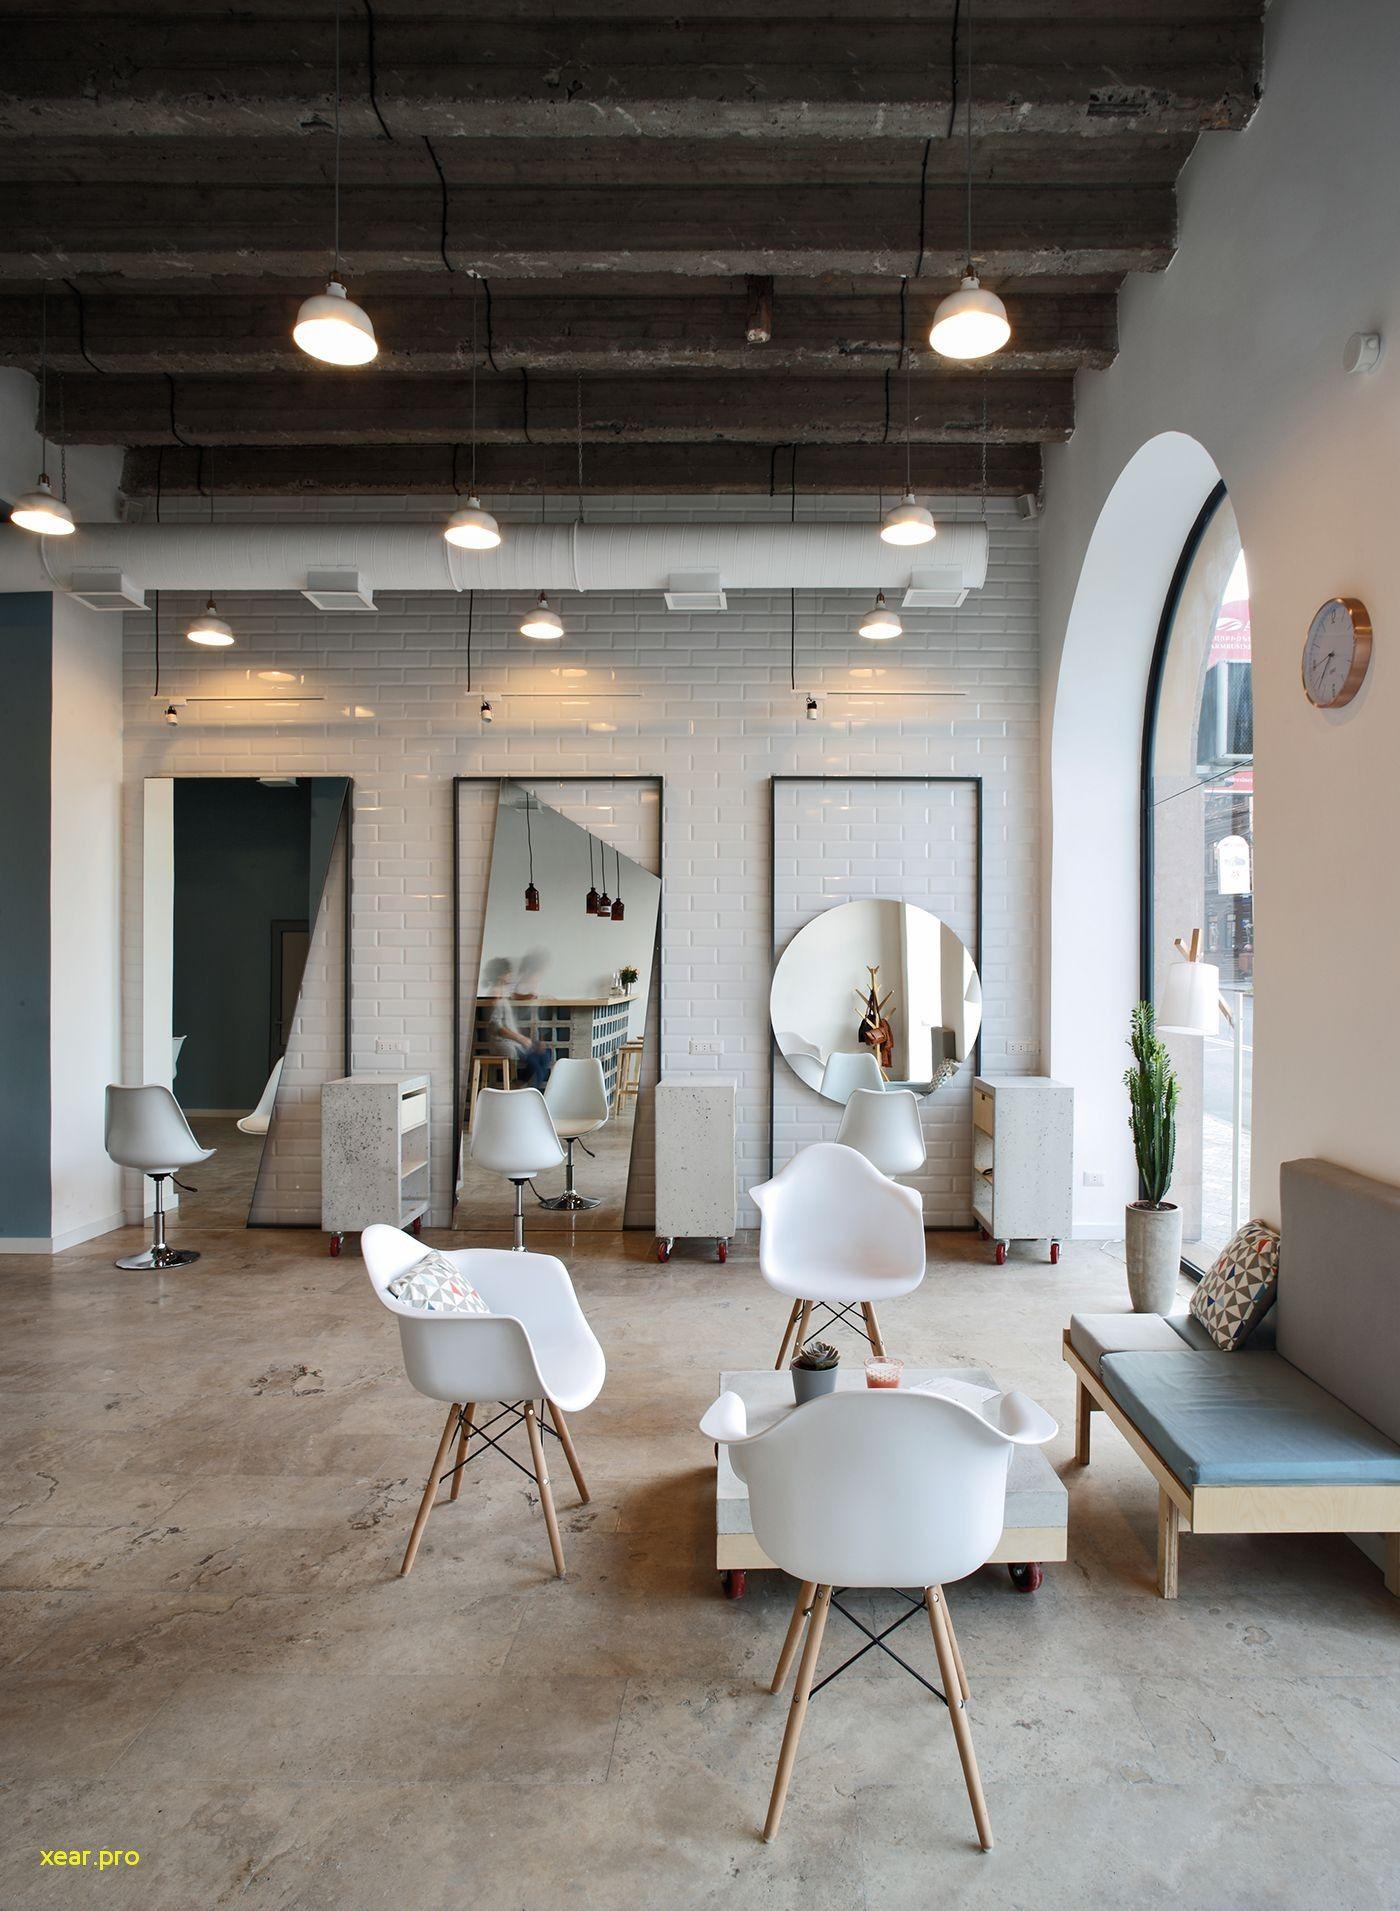 inspirational light concept nail salons nail art shop interior rh pinterest com